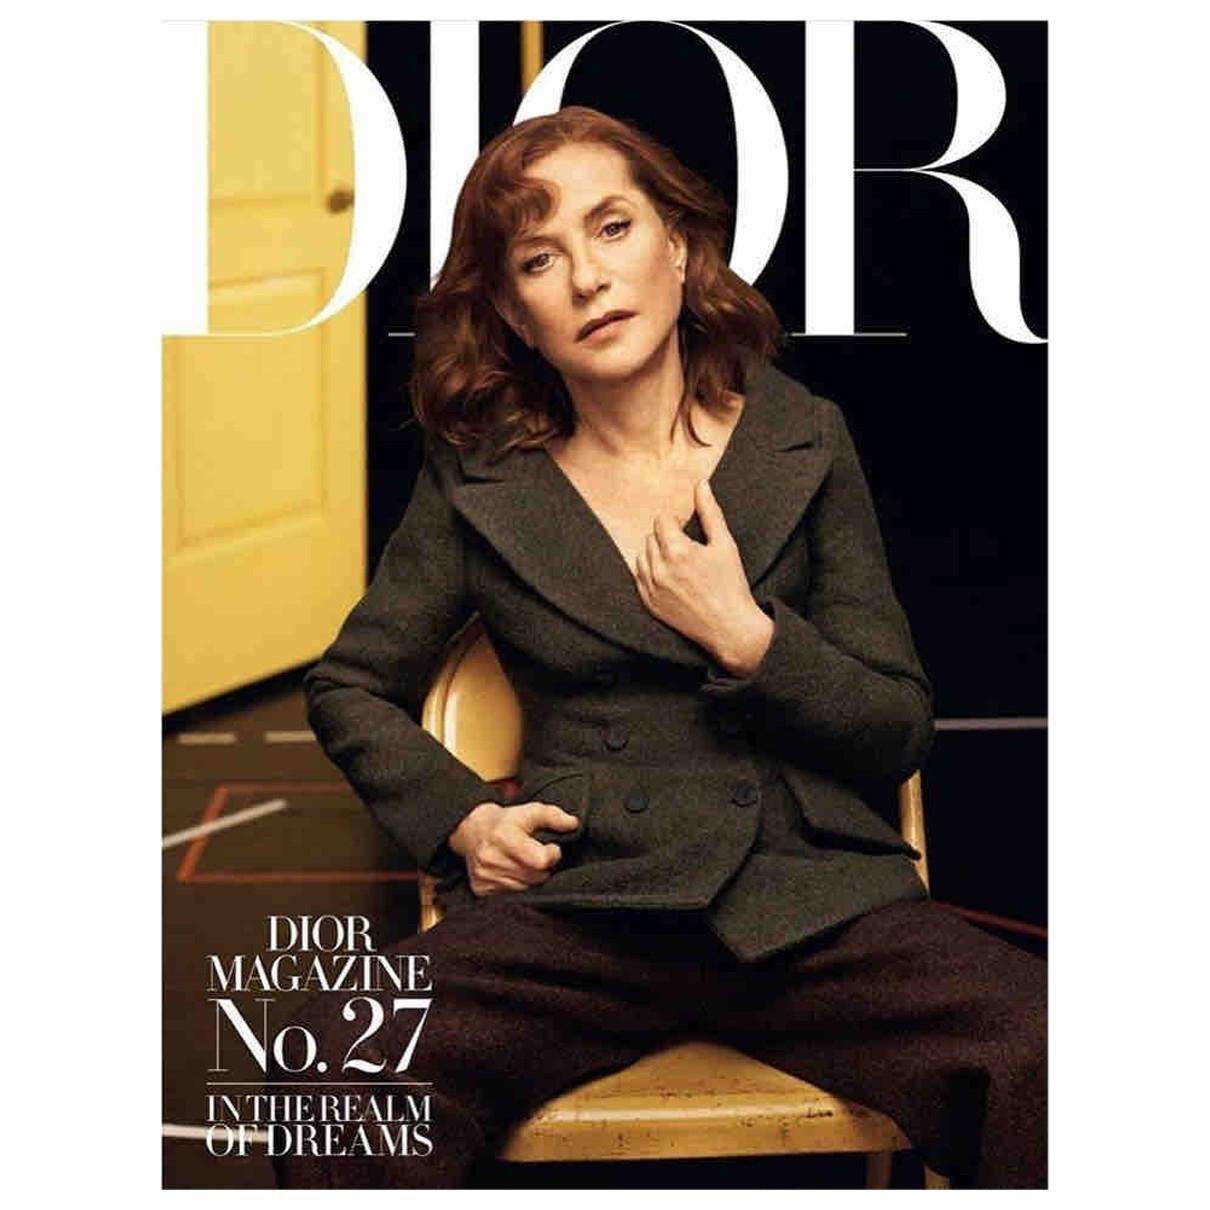 Dior N Multicolour Wood Fashion for Life & Living N